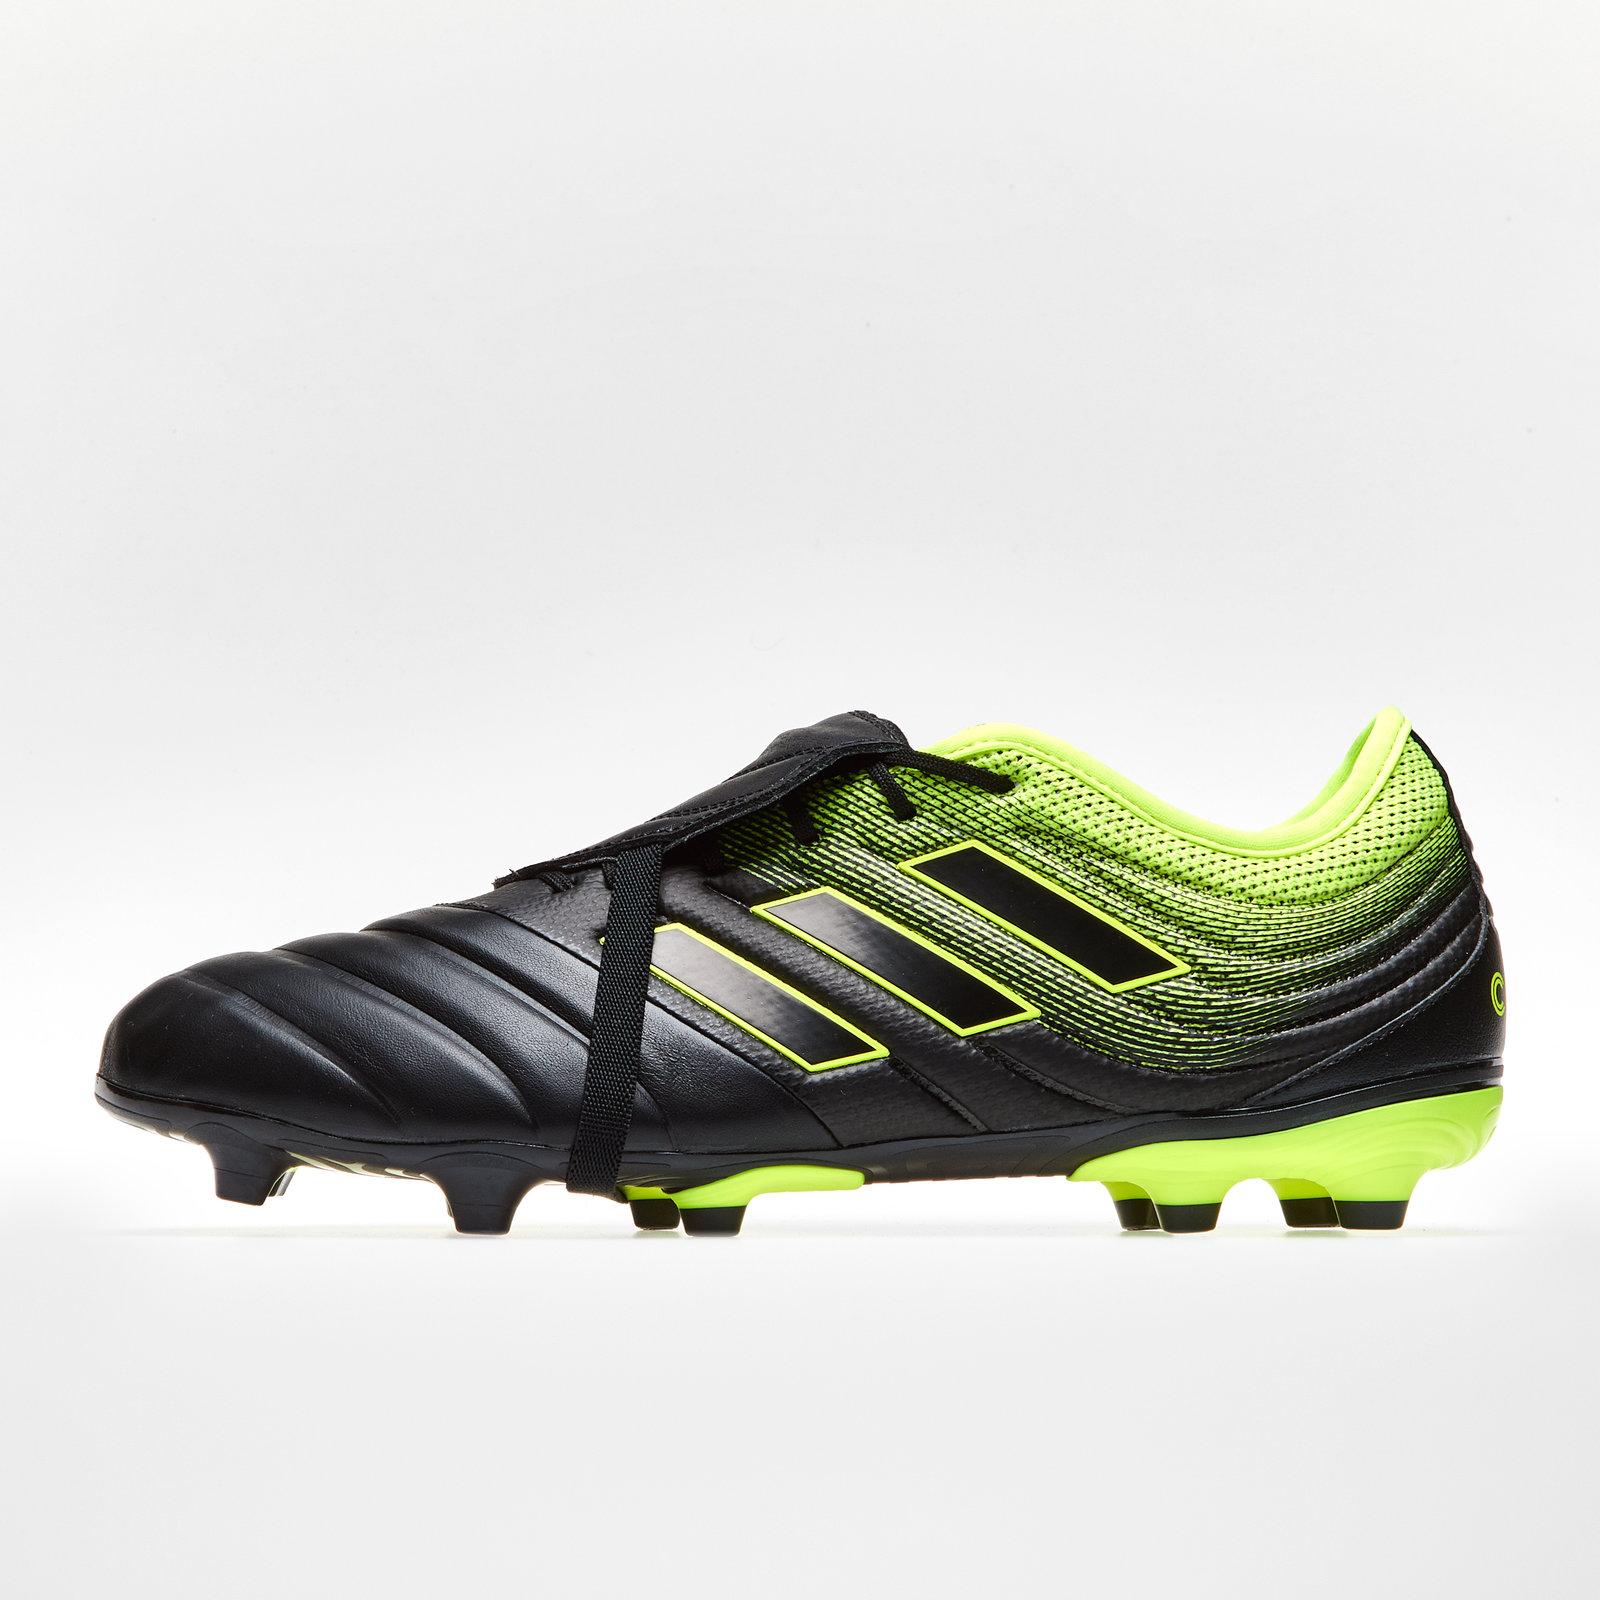 75fbd05e5e7 adidas Football Boots